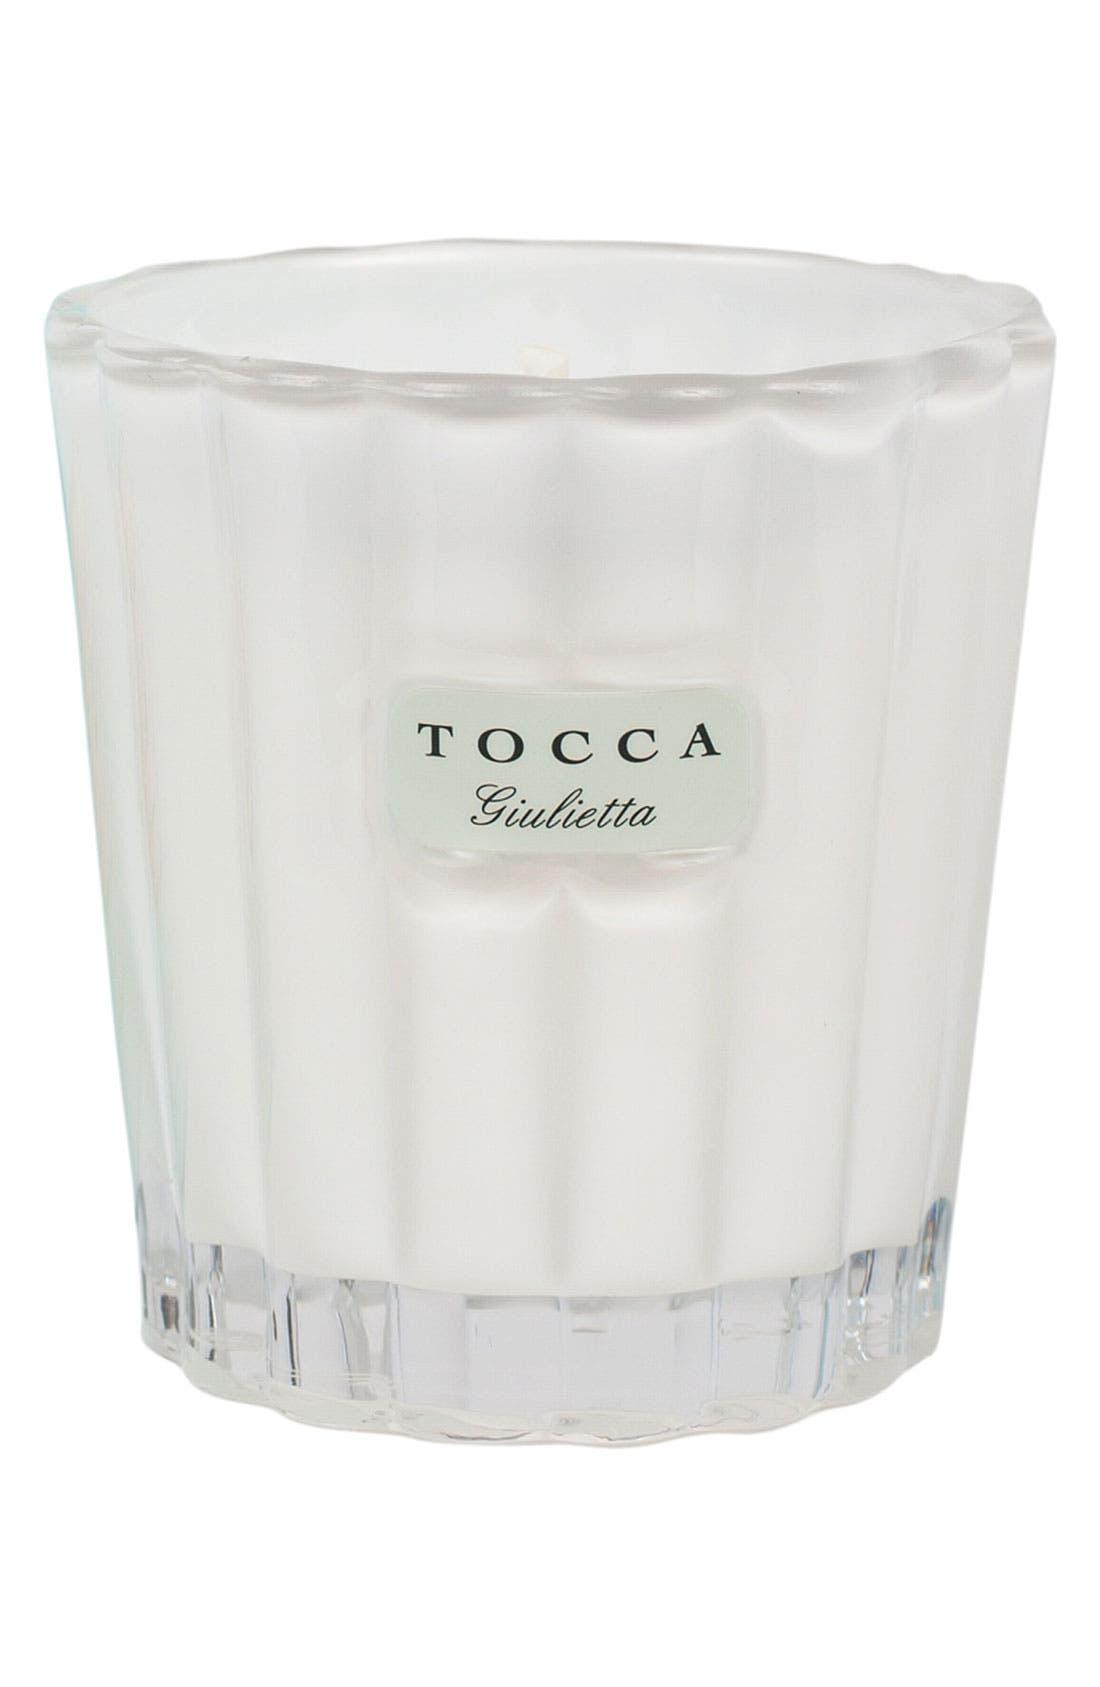 Main Image - TOCCA 'Giulietta' Candelina